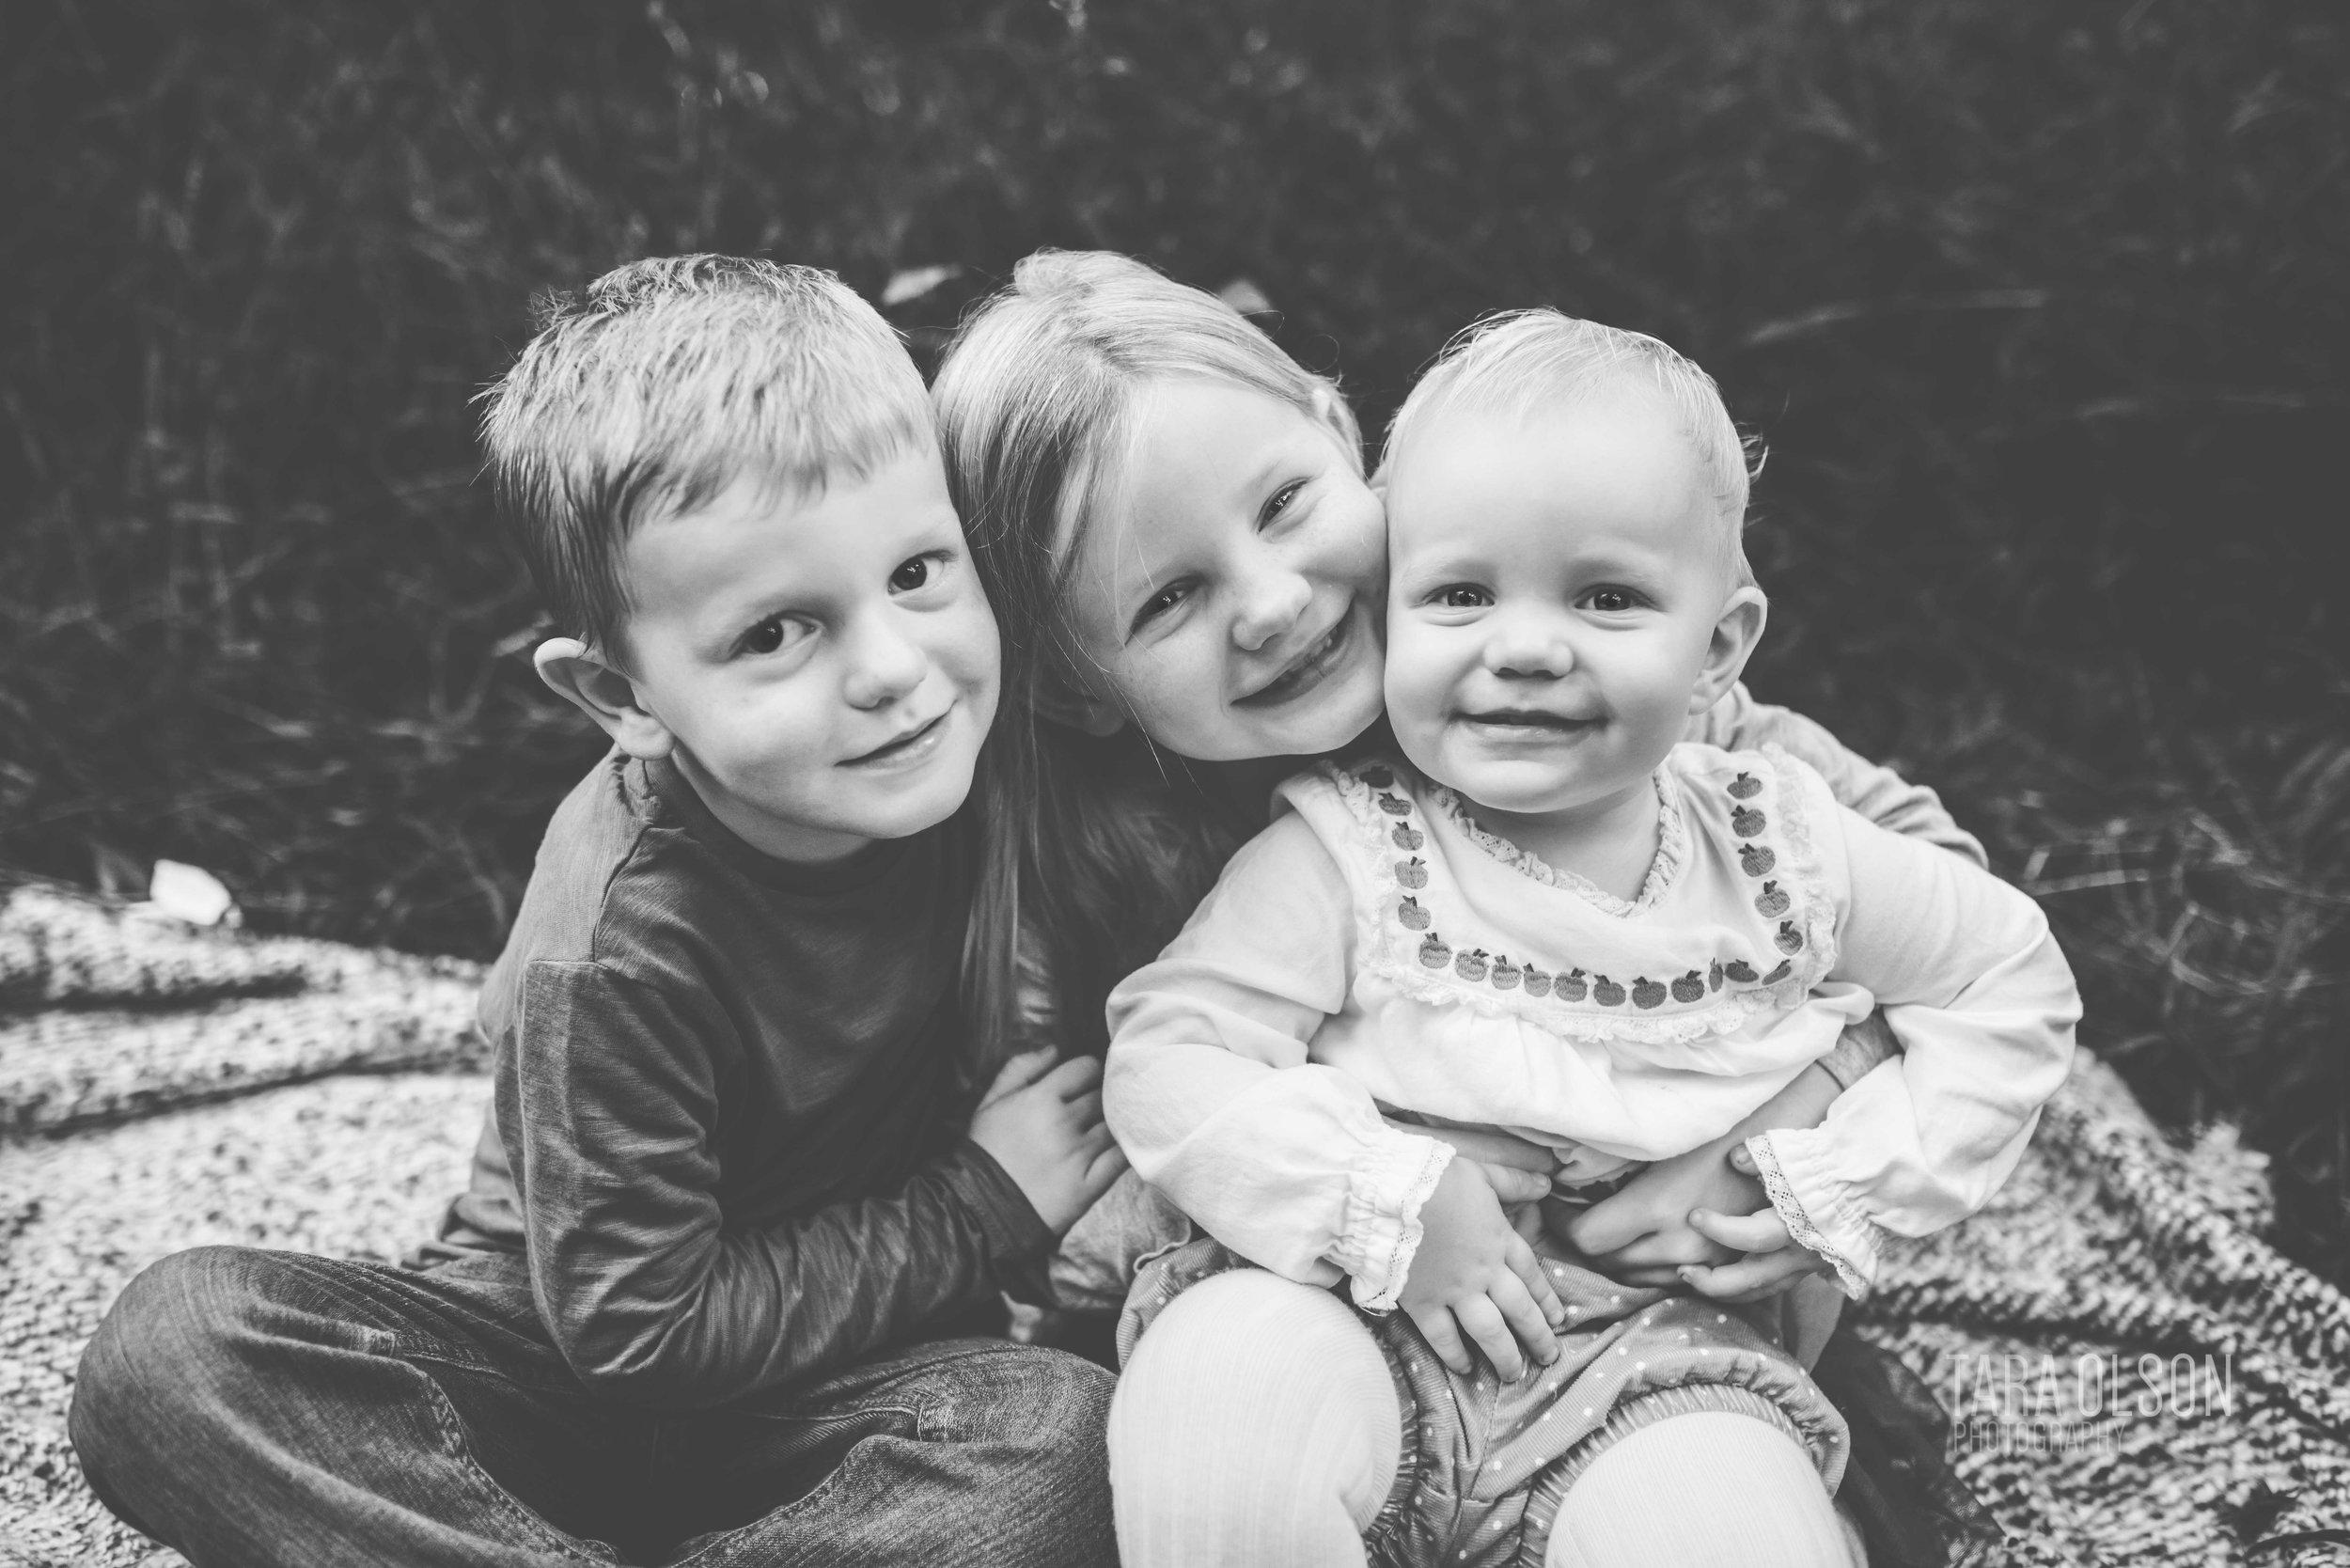 Hawkins_Arlington-Virginia-Family-Photographer_Tara-Olson-Photography_4223-2.jpg